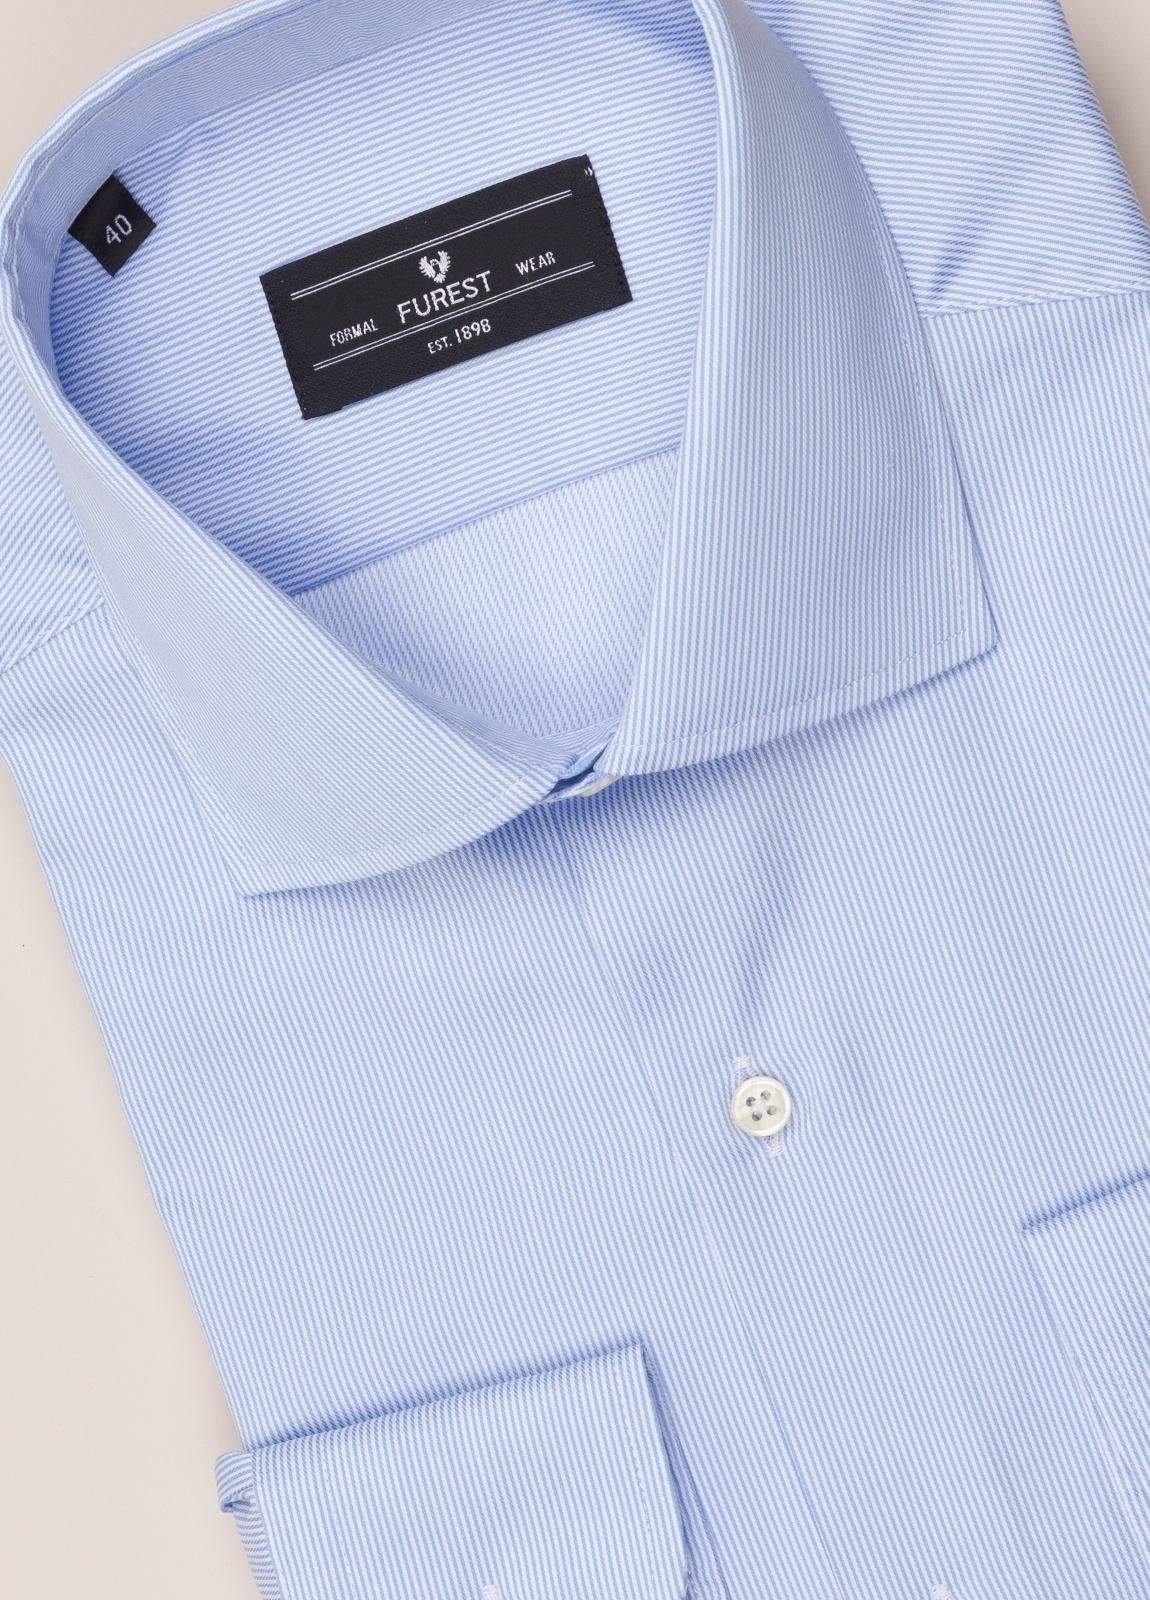 Camisa vestir FUREST COLECCIÓN regular fit cuello italiano rayas celeste - Ítem1